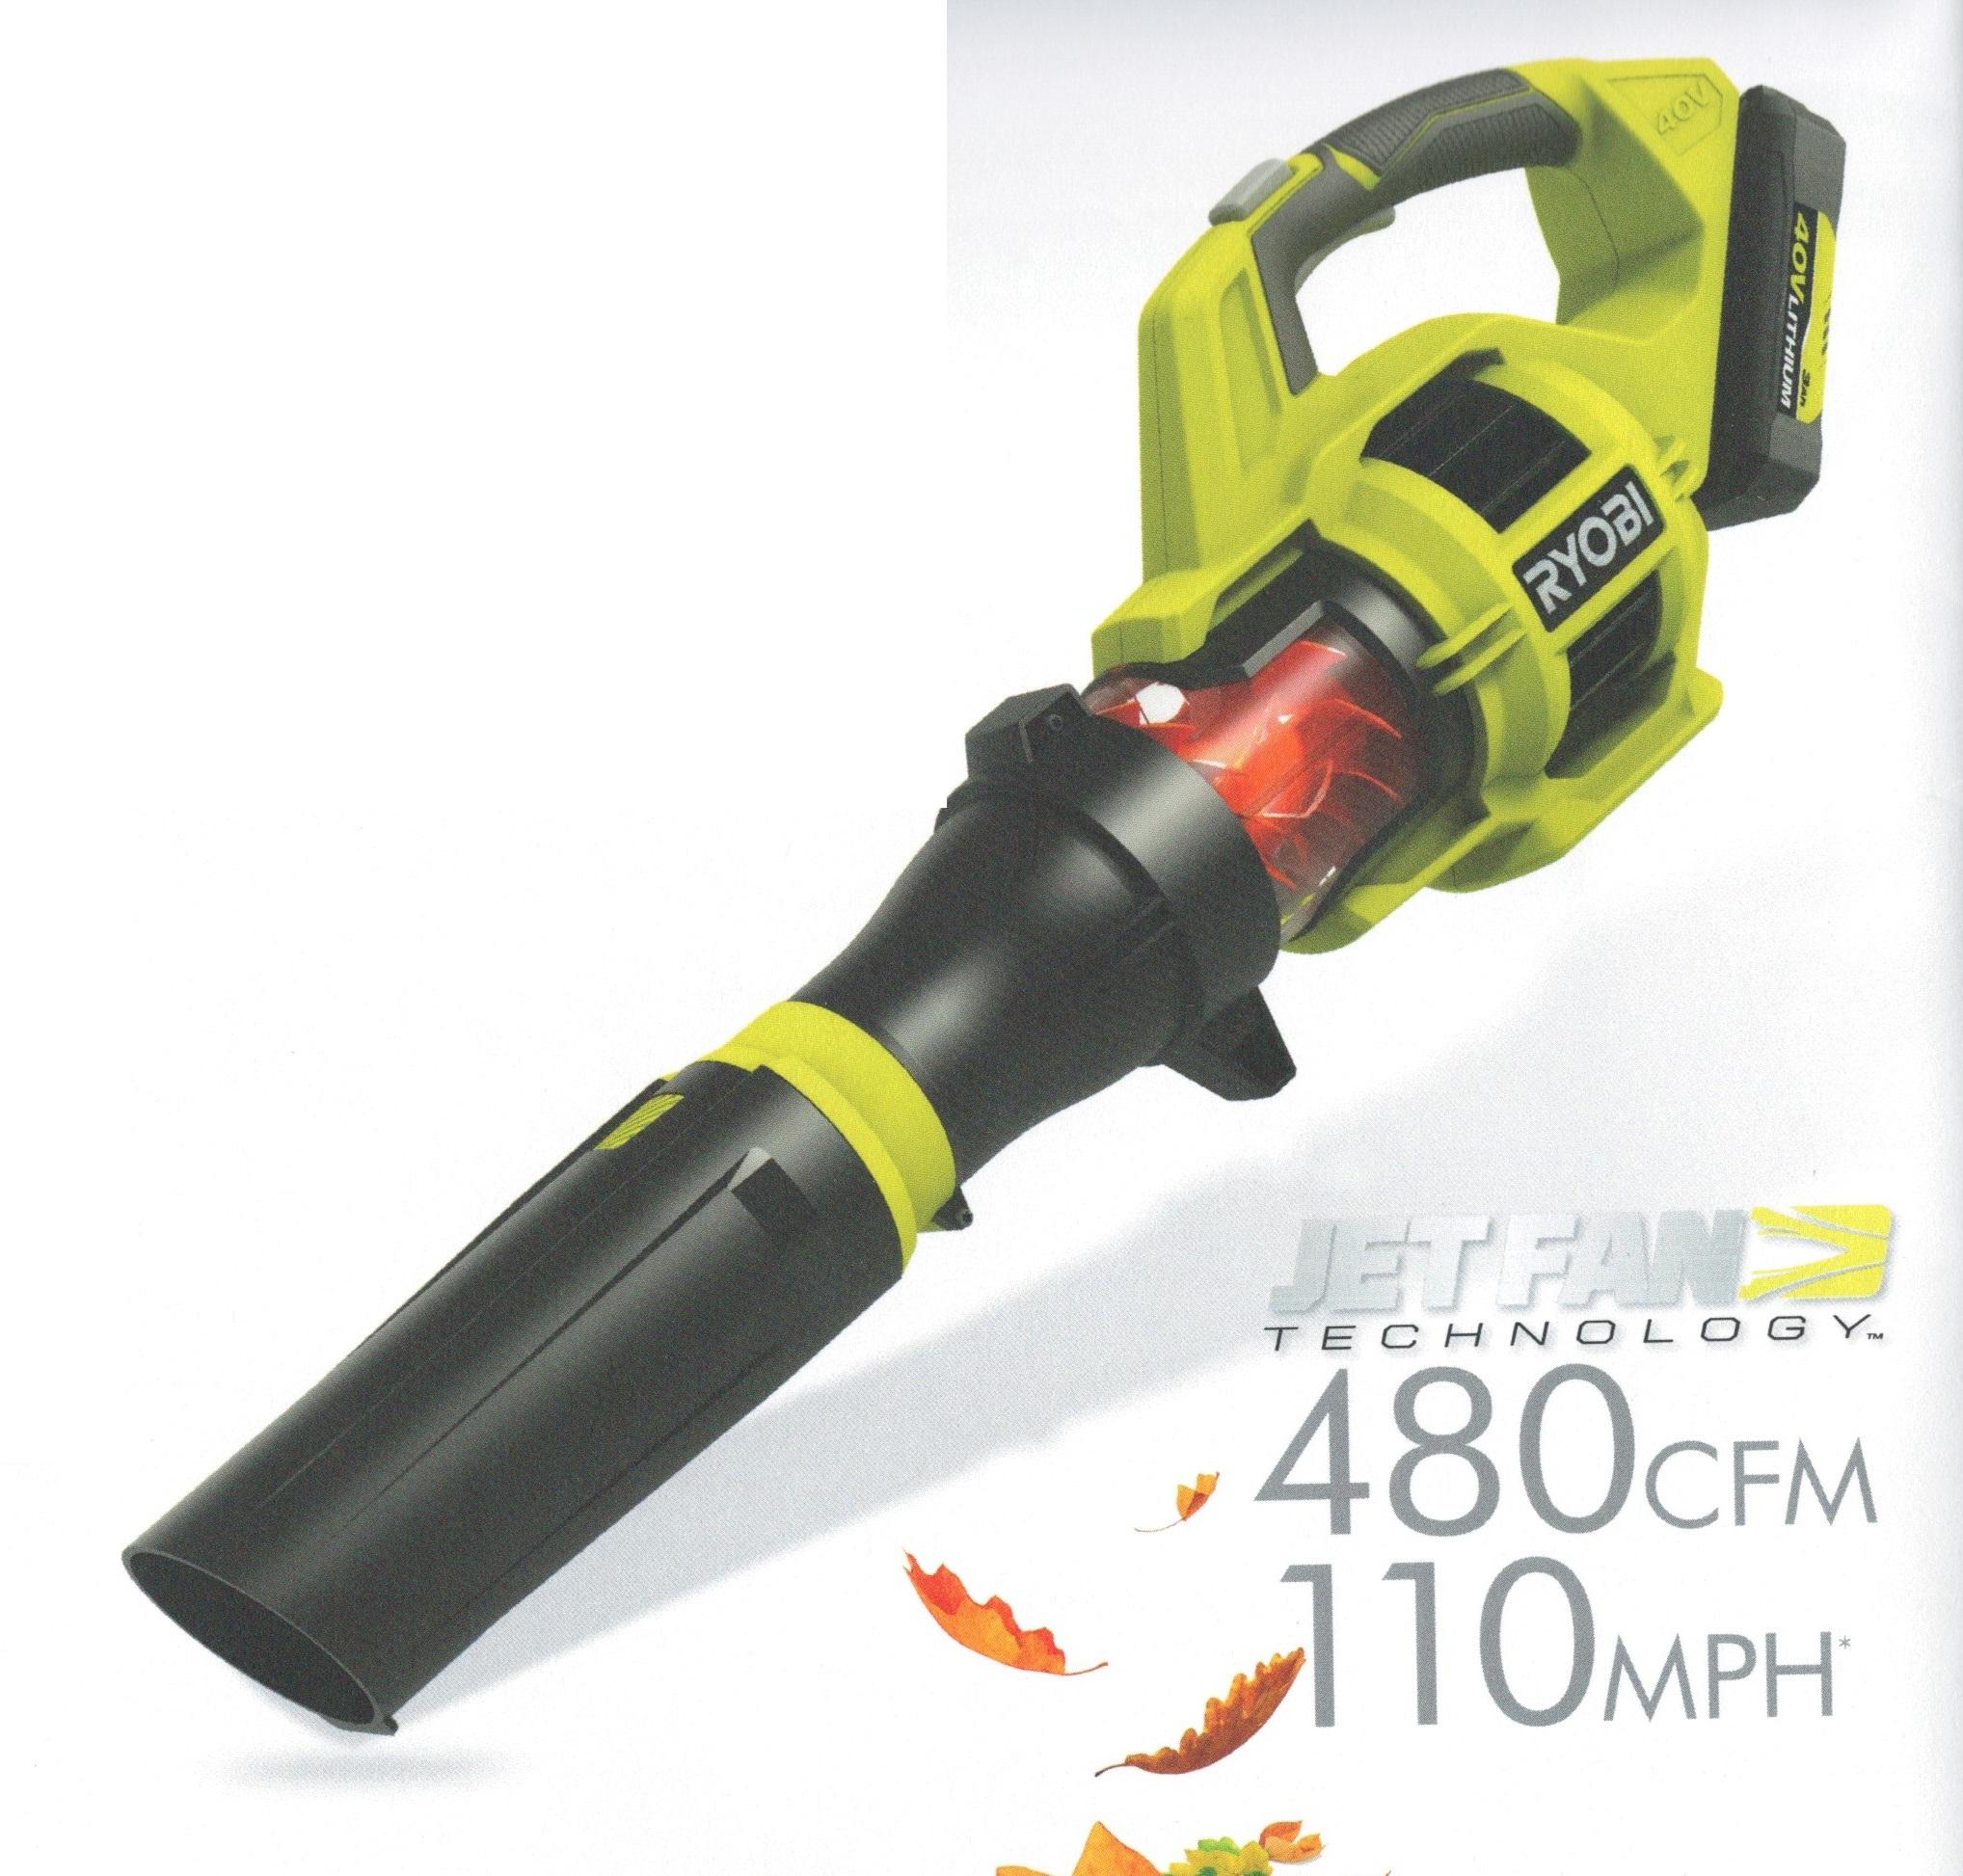 Spring 2017 Ryobi New Outdoor Power Equipment Tool Craze